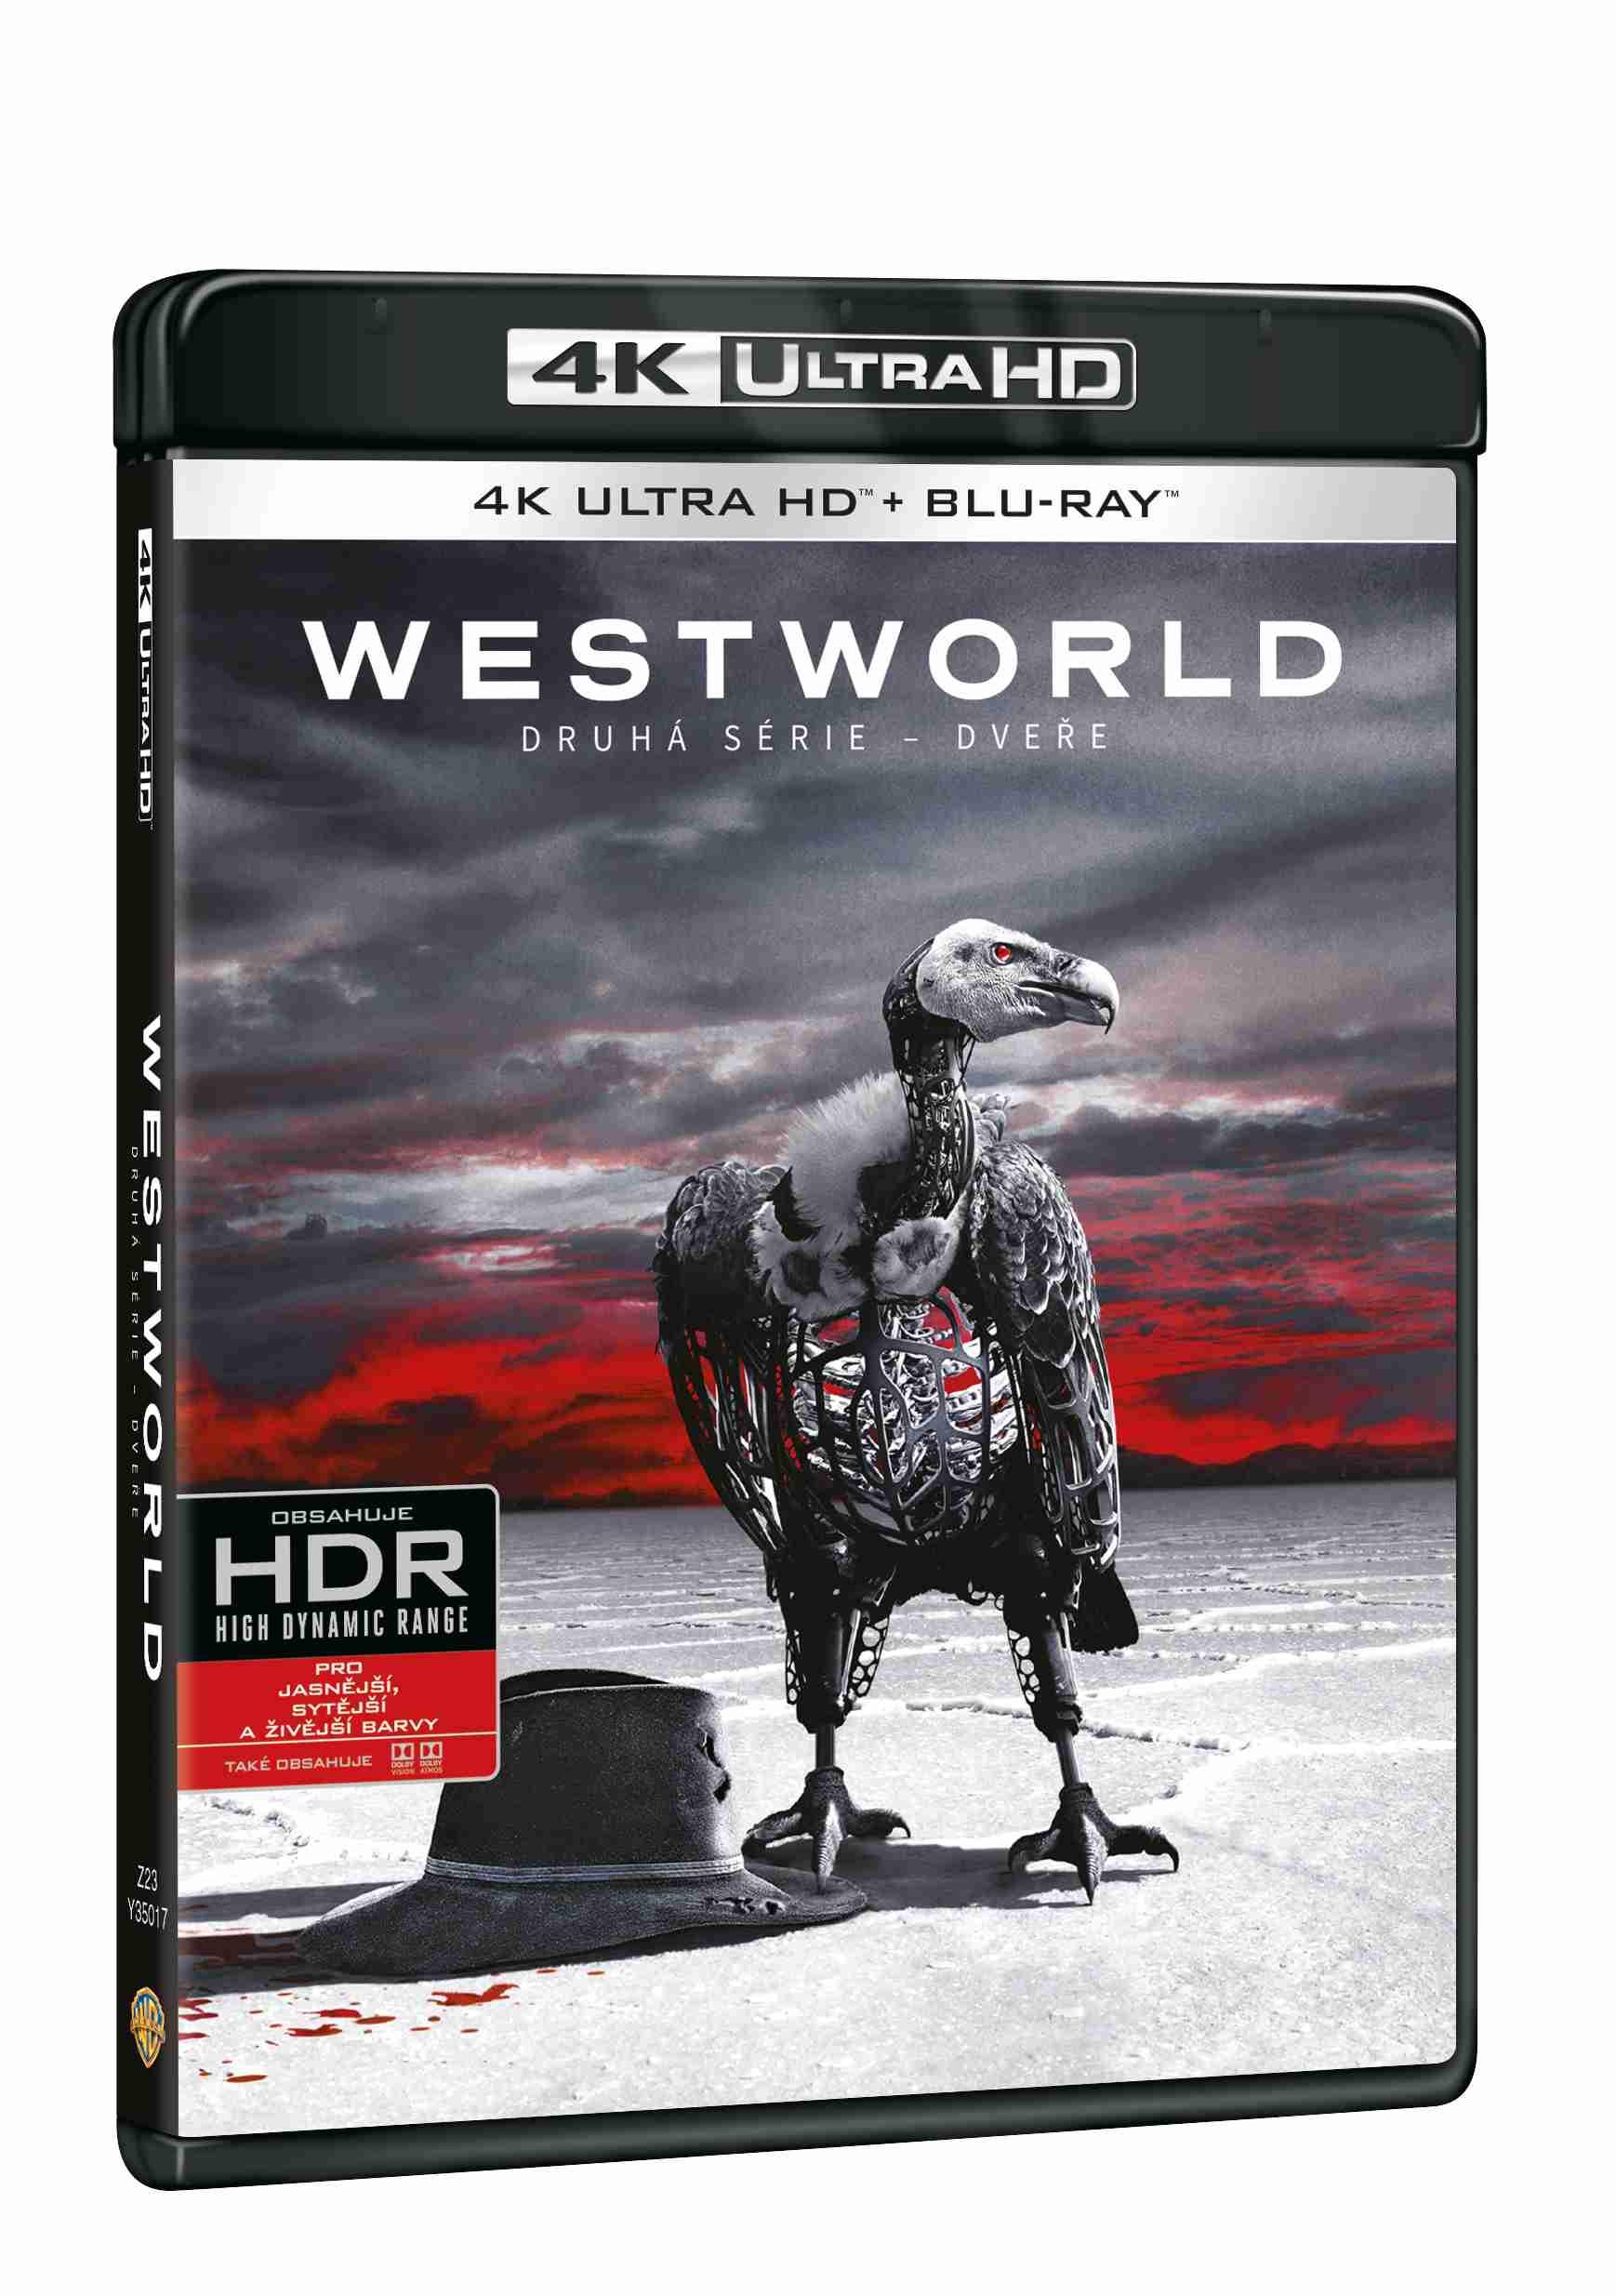 Westworld 2. série (4K ULTRA HD) - UHD Blu-ray (3 BD)